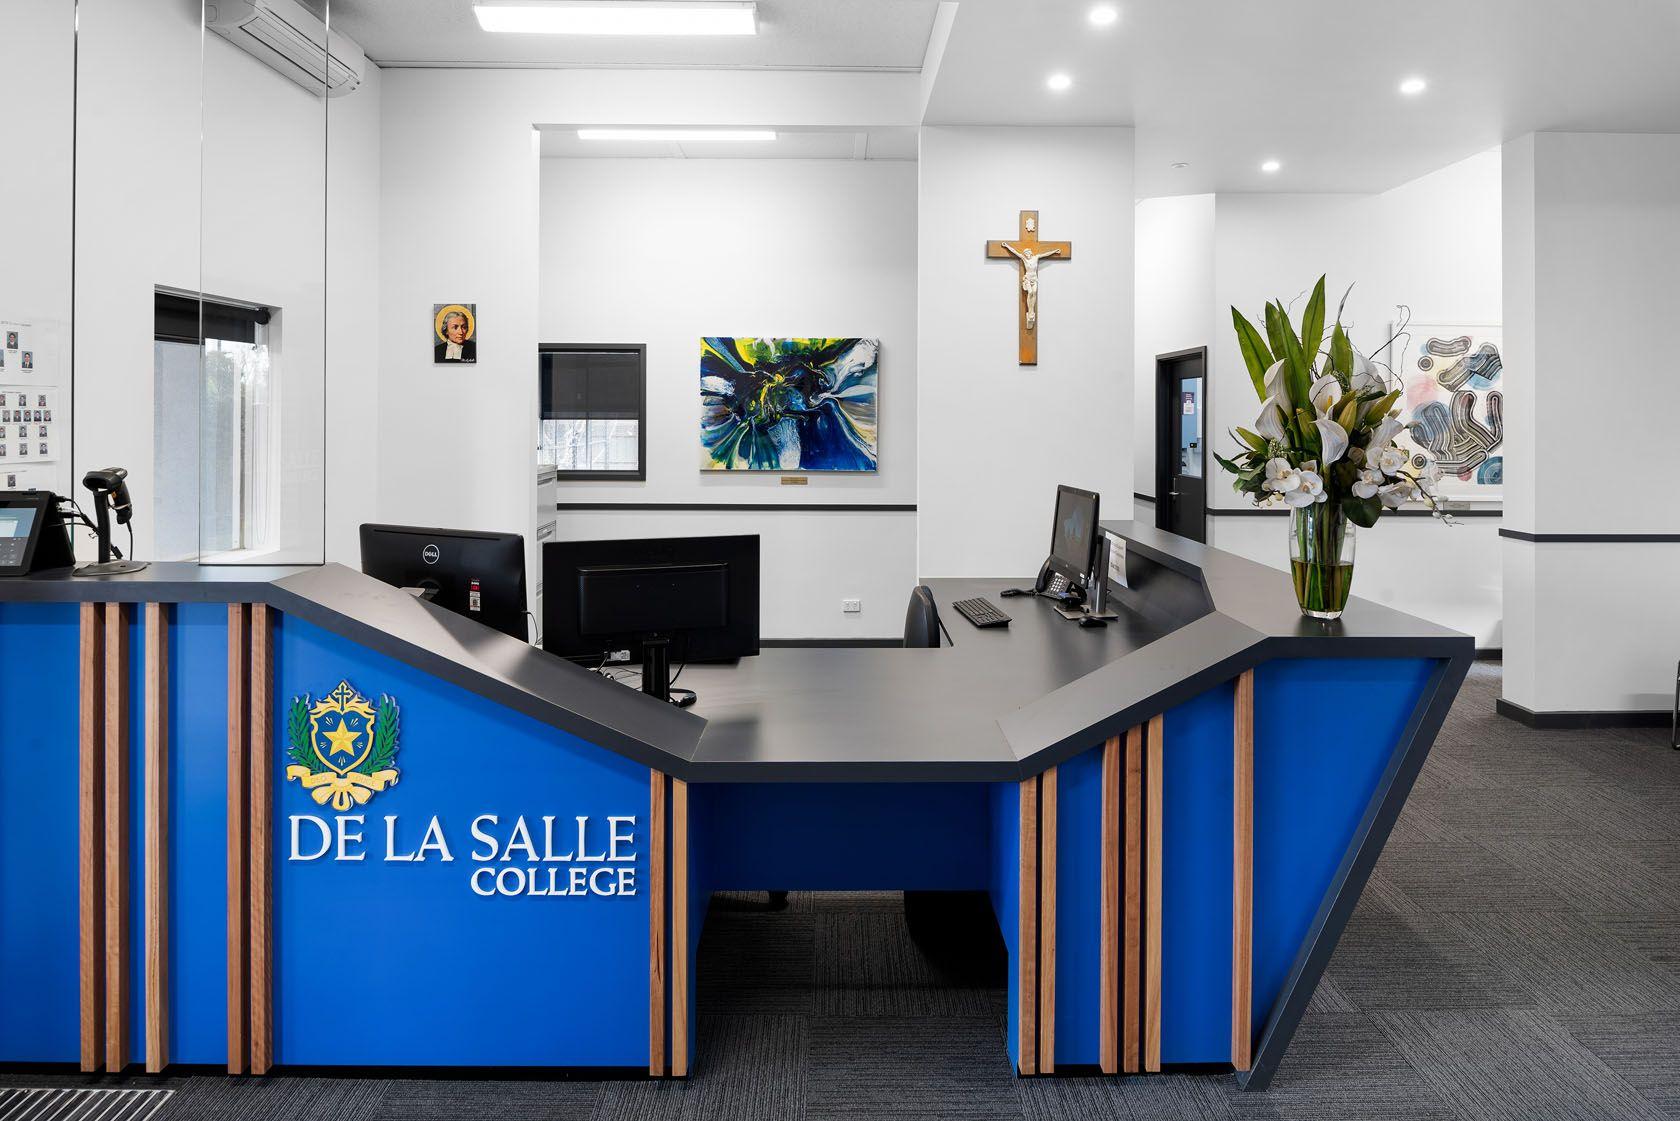 De La Salle - Holy Eucharist Campus